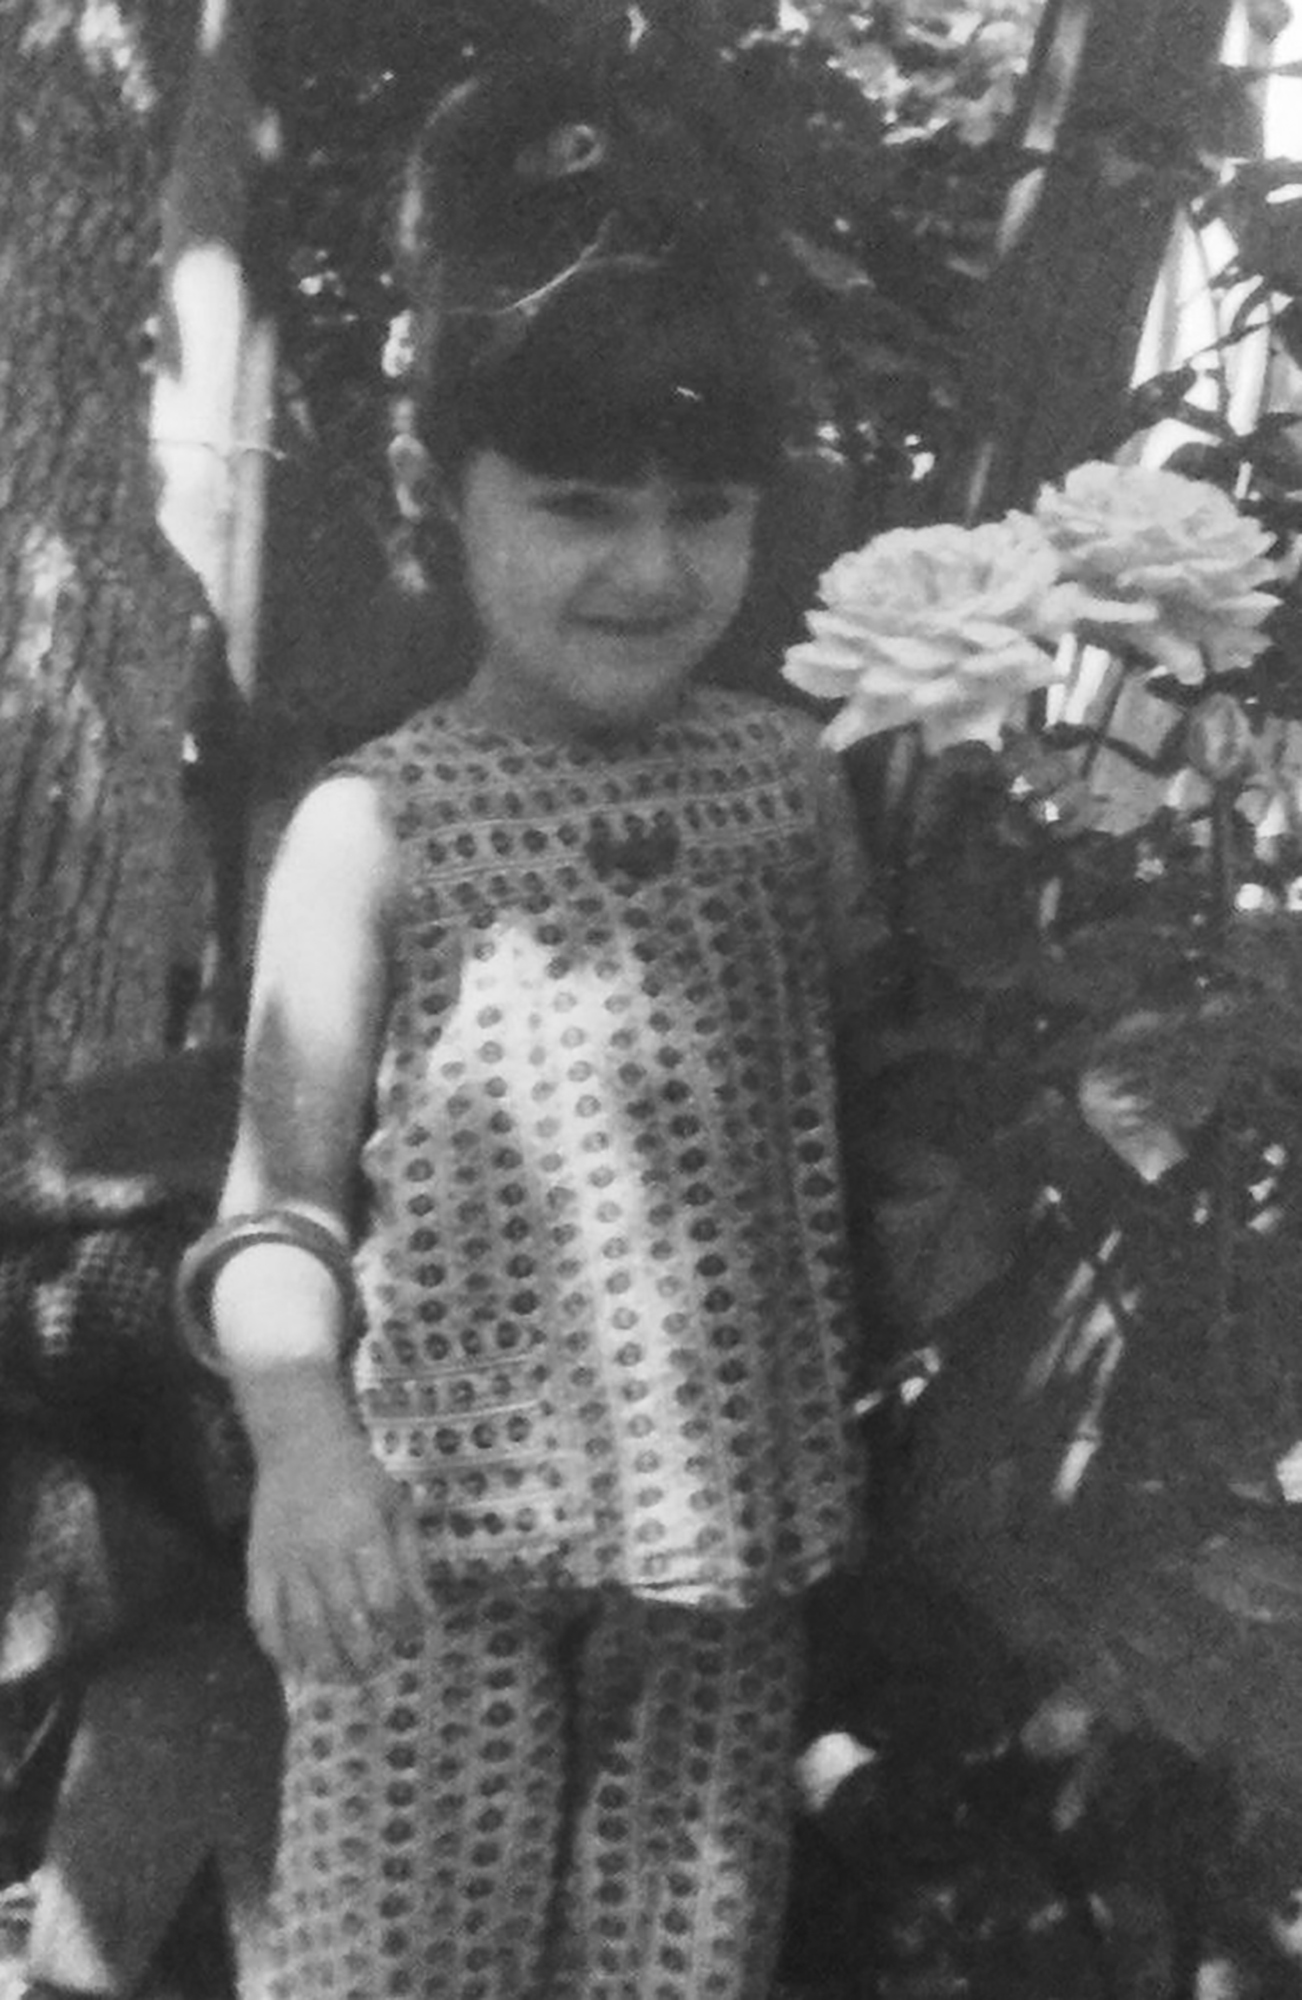 3. Renara young 2